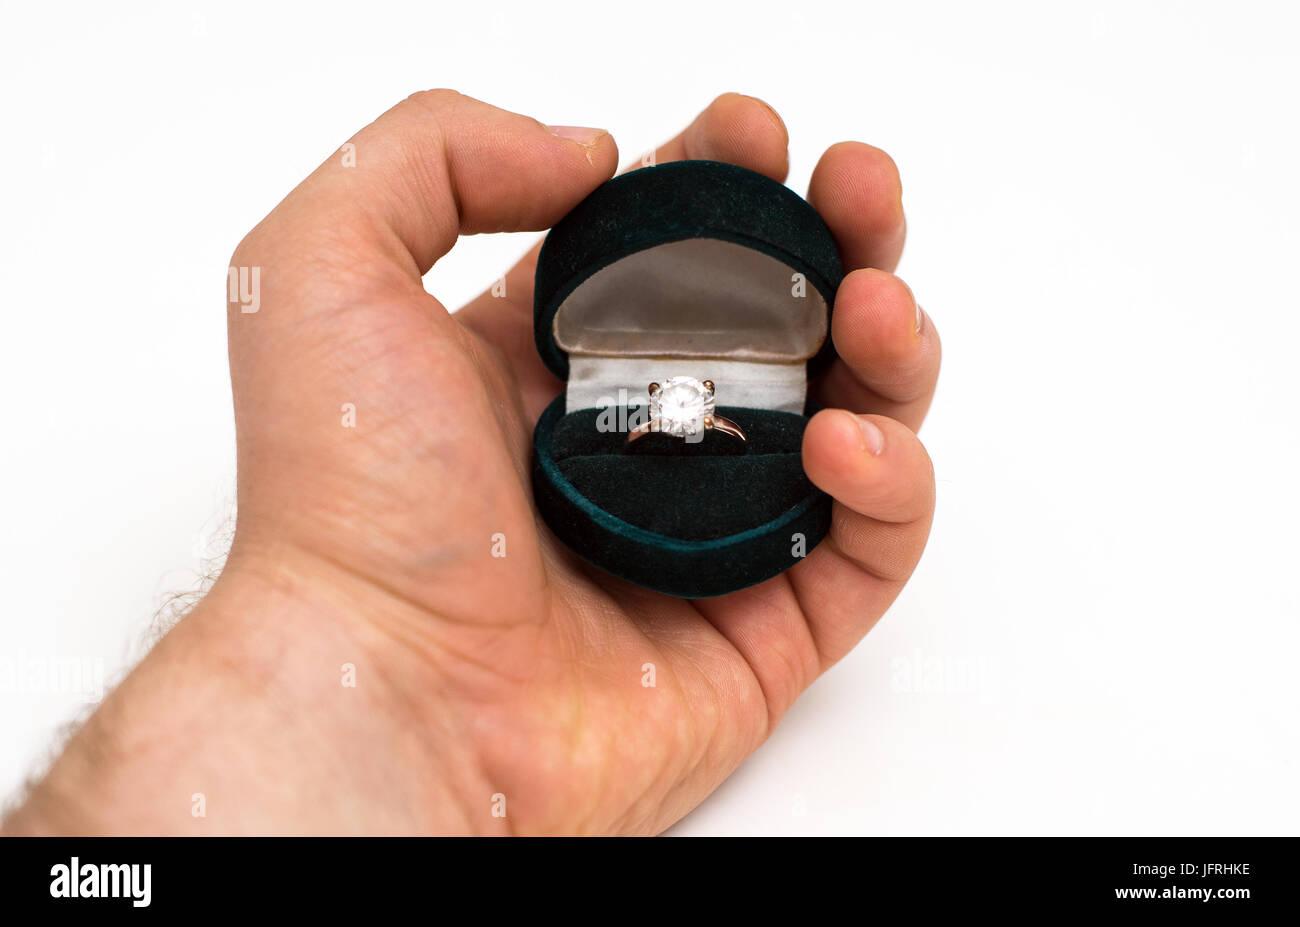 Man's hand holding wedding ring with diamond. - Stock Image